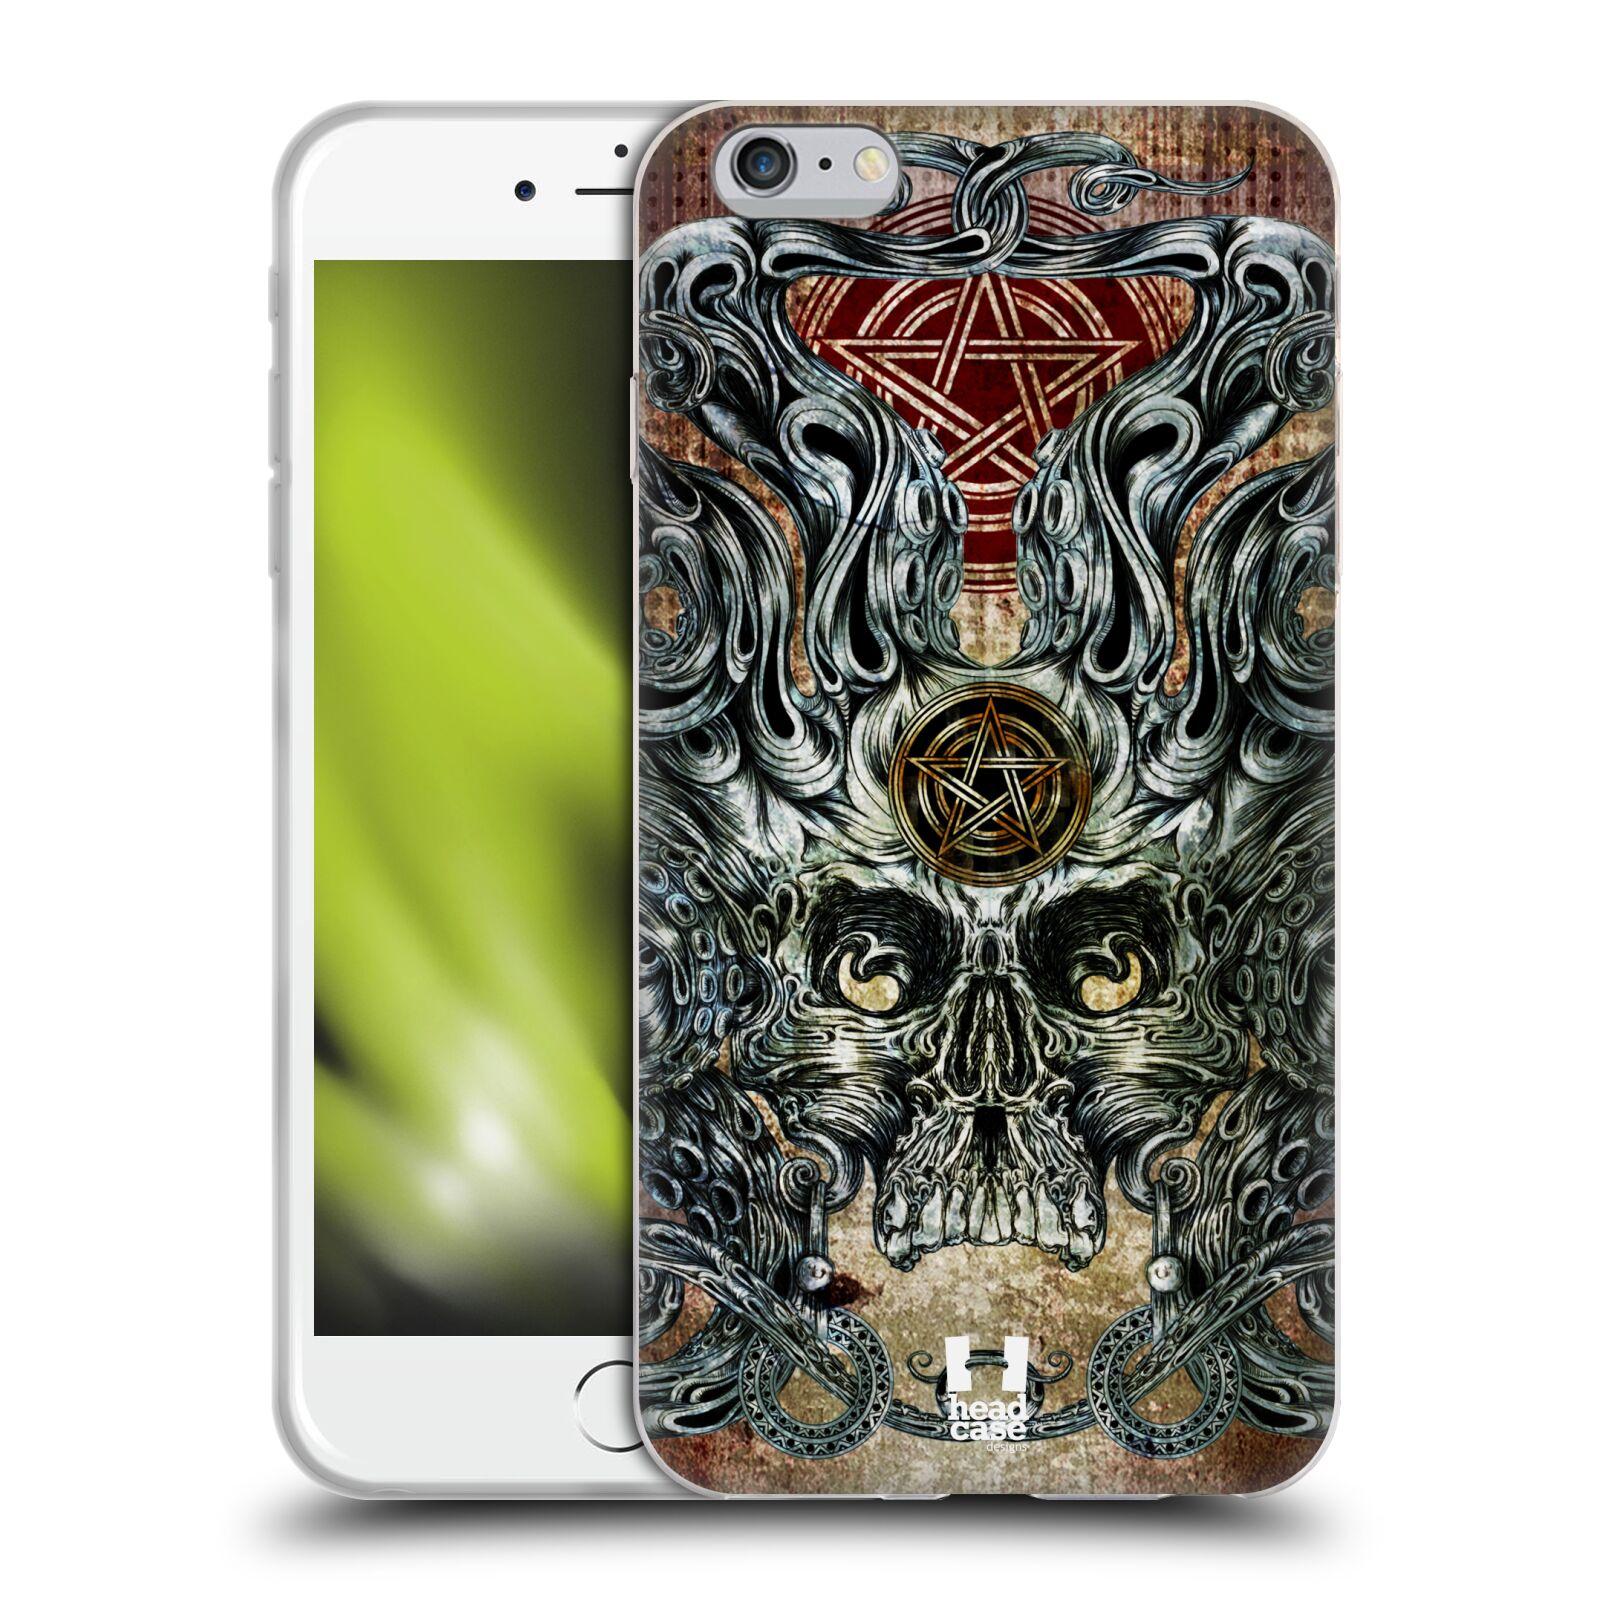 HEAD CASE silikonový obal na mobil Apple Iphone 6 PLUS/ 6S PLUS vzor Kreslené lebky METAL chobotnice